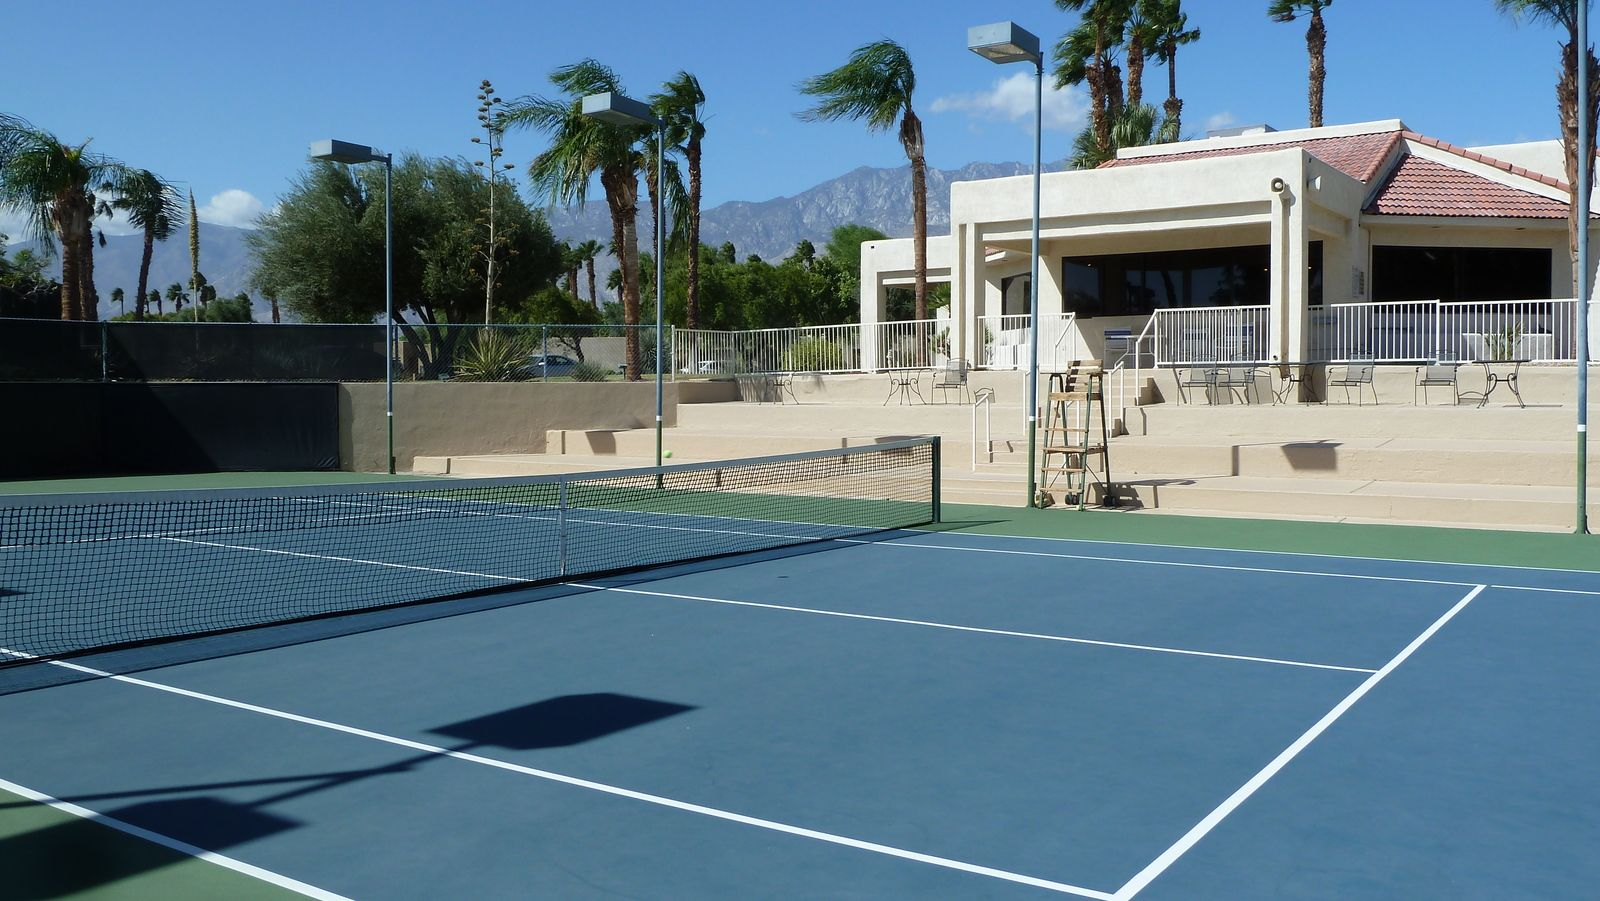 garden city casino tennis club